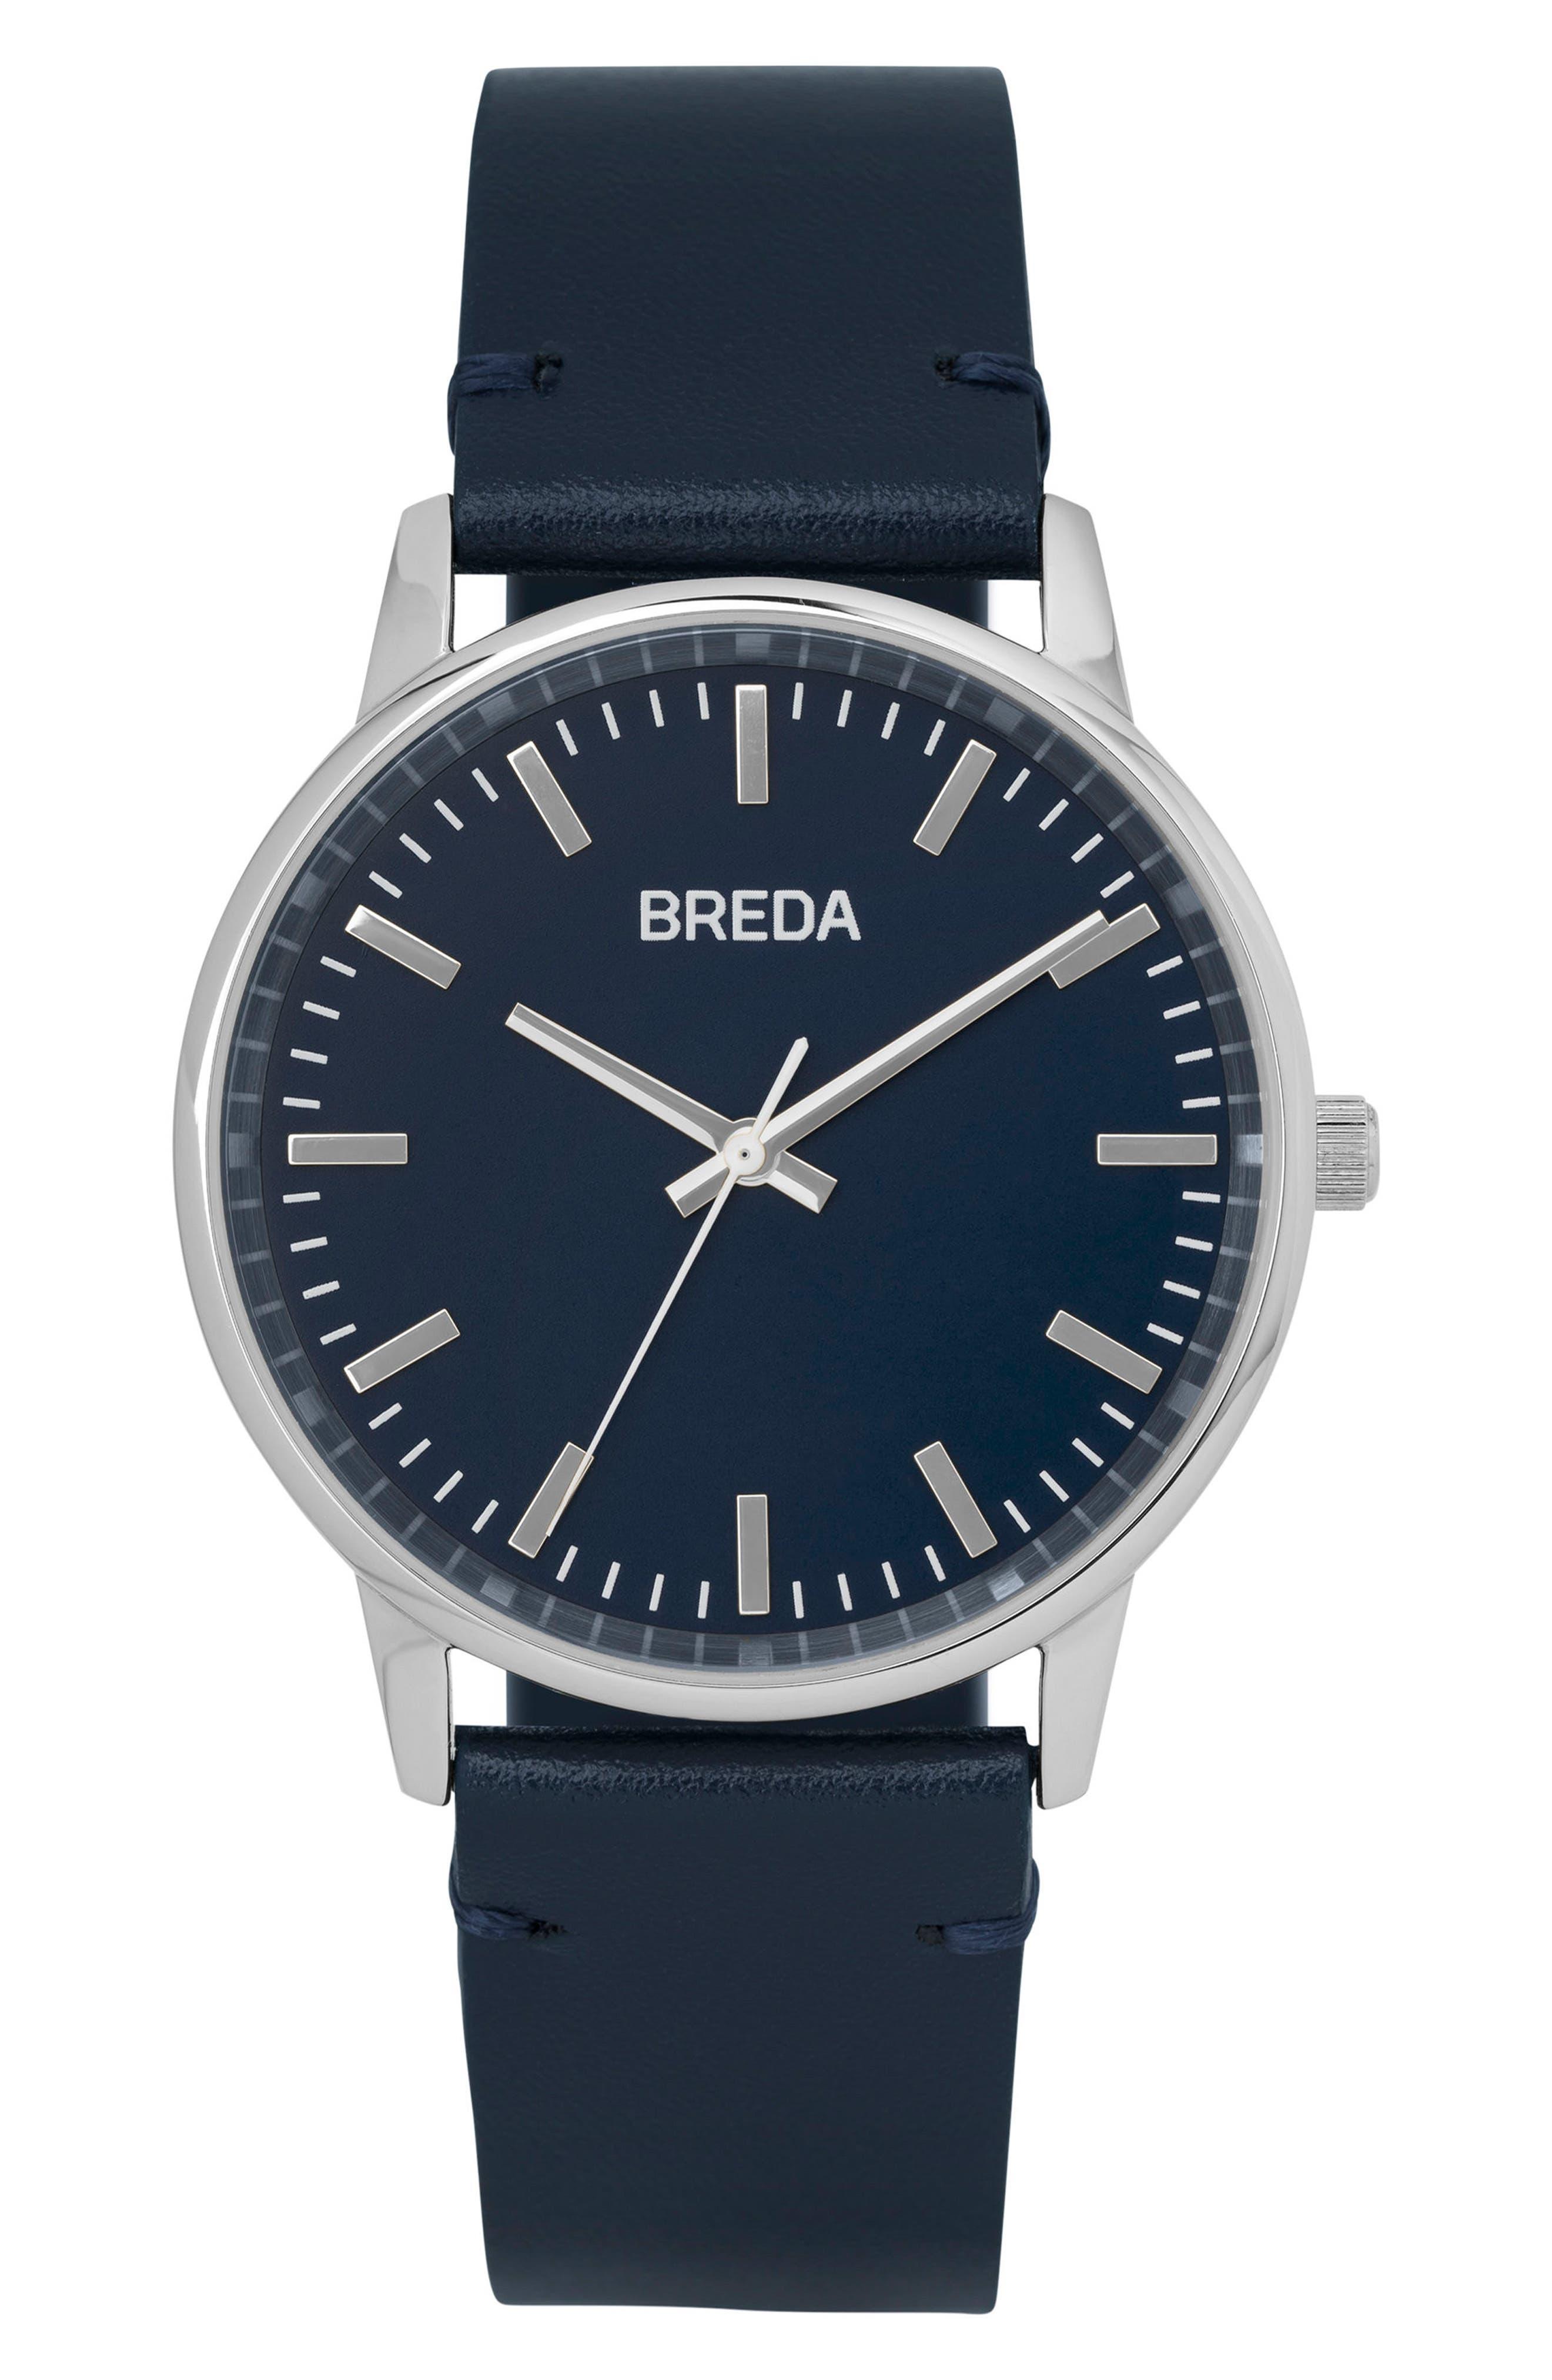 Main Image - BREDA Zapf Leather Strap Watch, 39mm